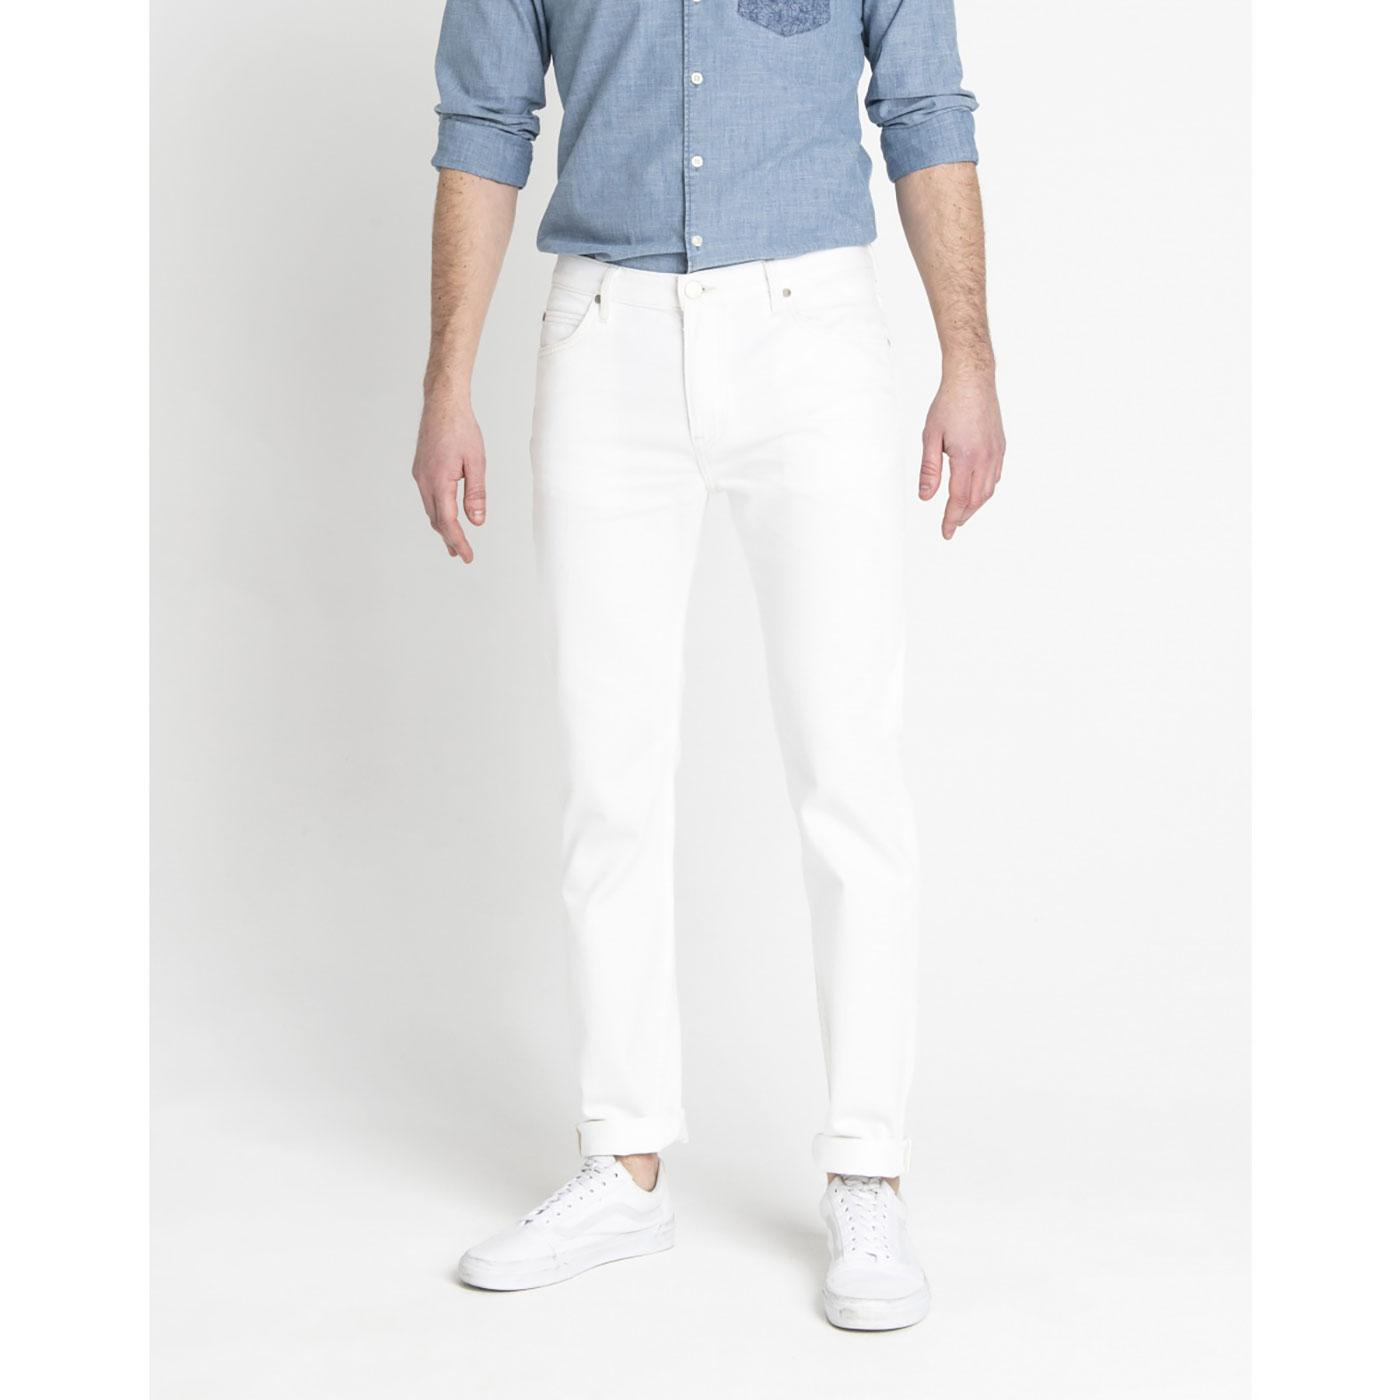 Rider LEE Slim Leg Retro Denim Jeans - Off White